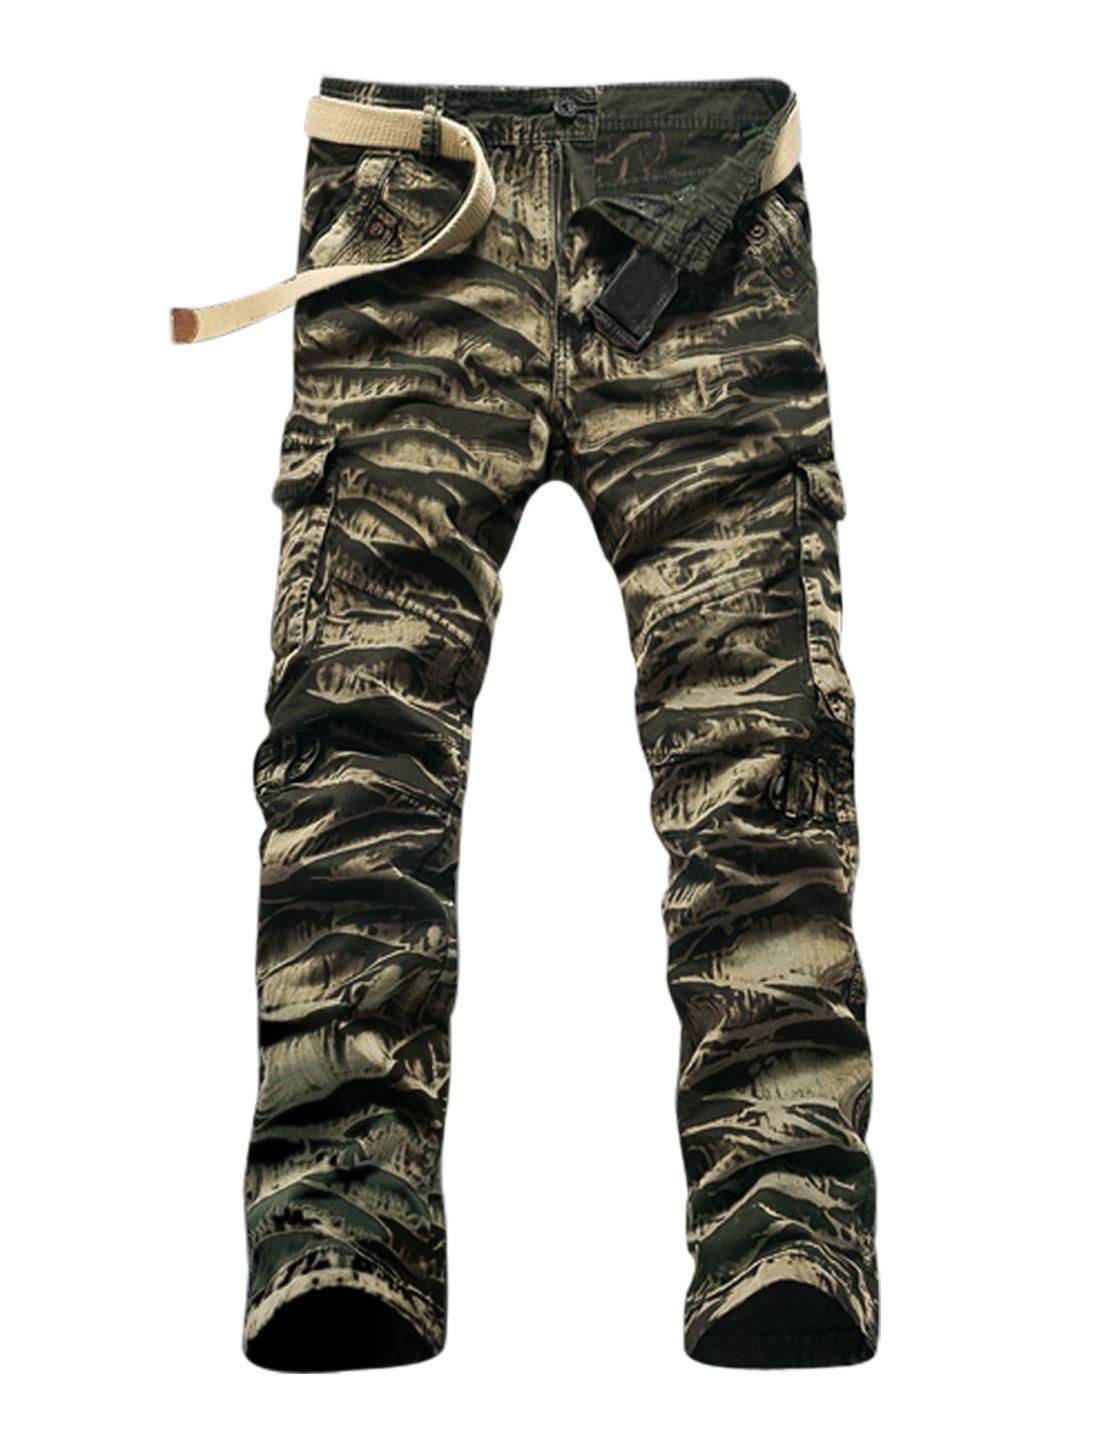 Man Practical Pockets Tiger Stripe Twill Cargo Army Green Beige W34